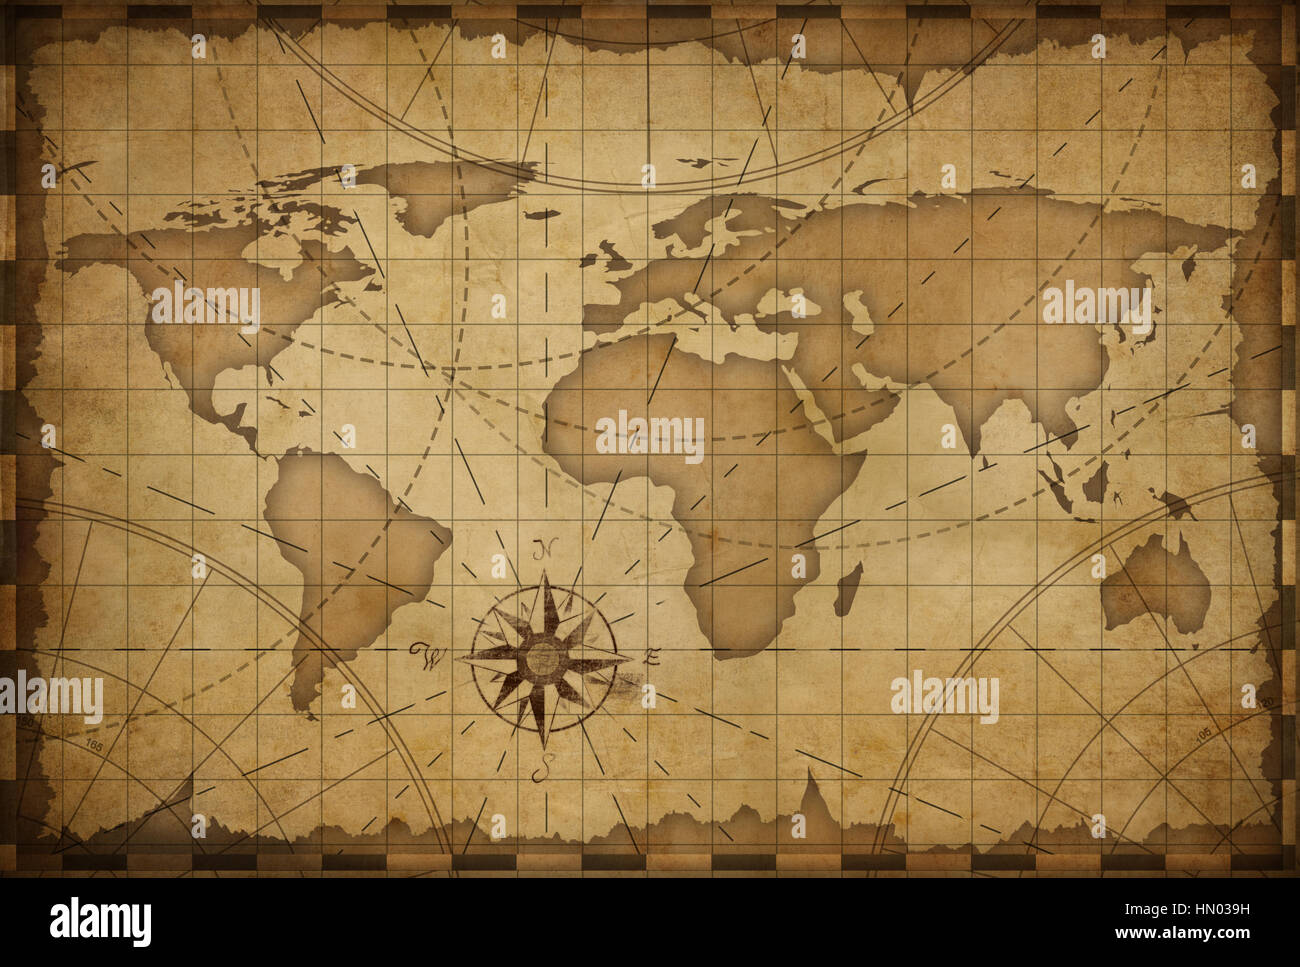 ancienne carte du monde th me nautique vintage background banque d 39 images photo stock. Black Bedroom Furniture Sets. Home Design Ideas